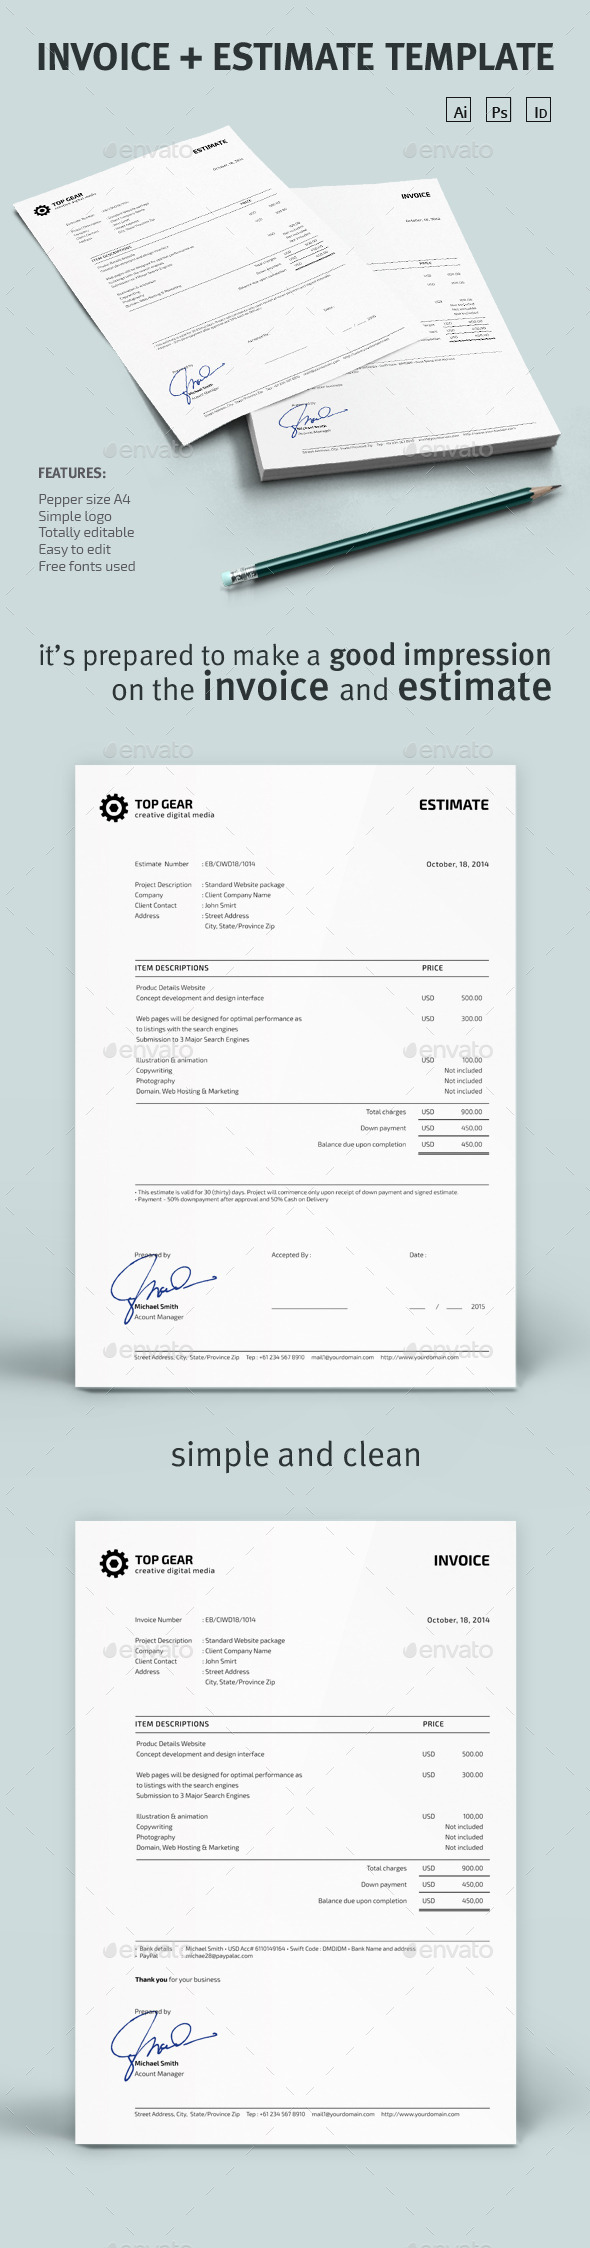 Invoice Estimate Template By SilukEight GraphicRiver - Invoice estimate template